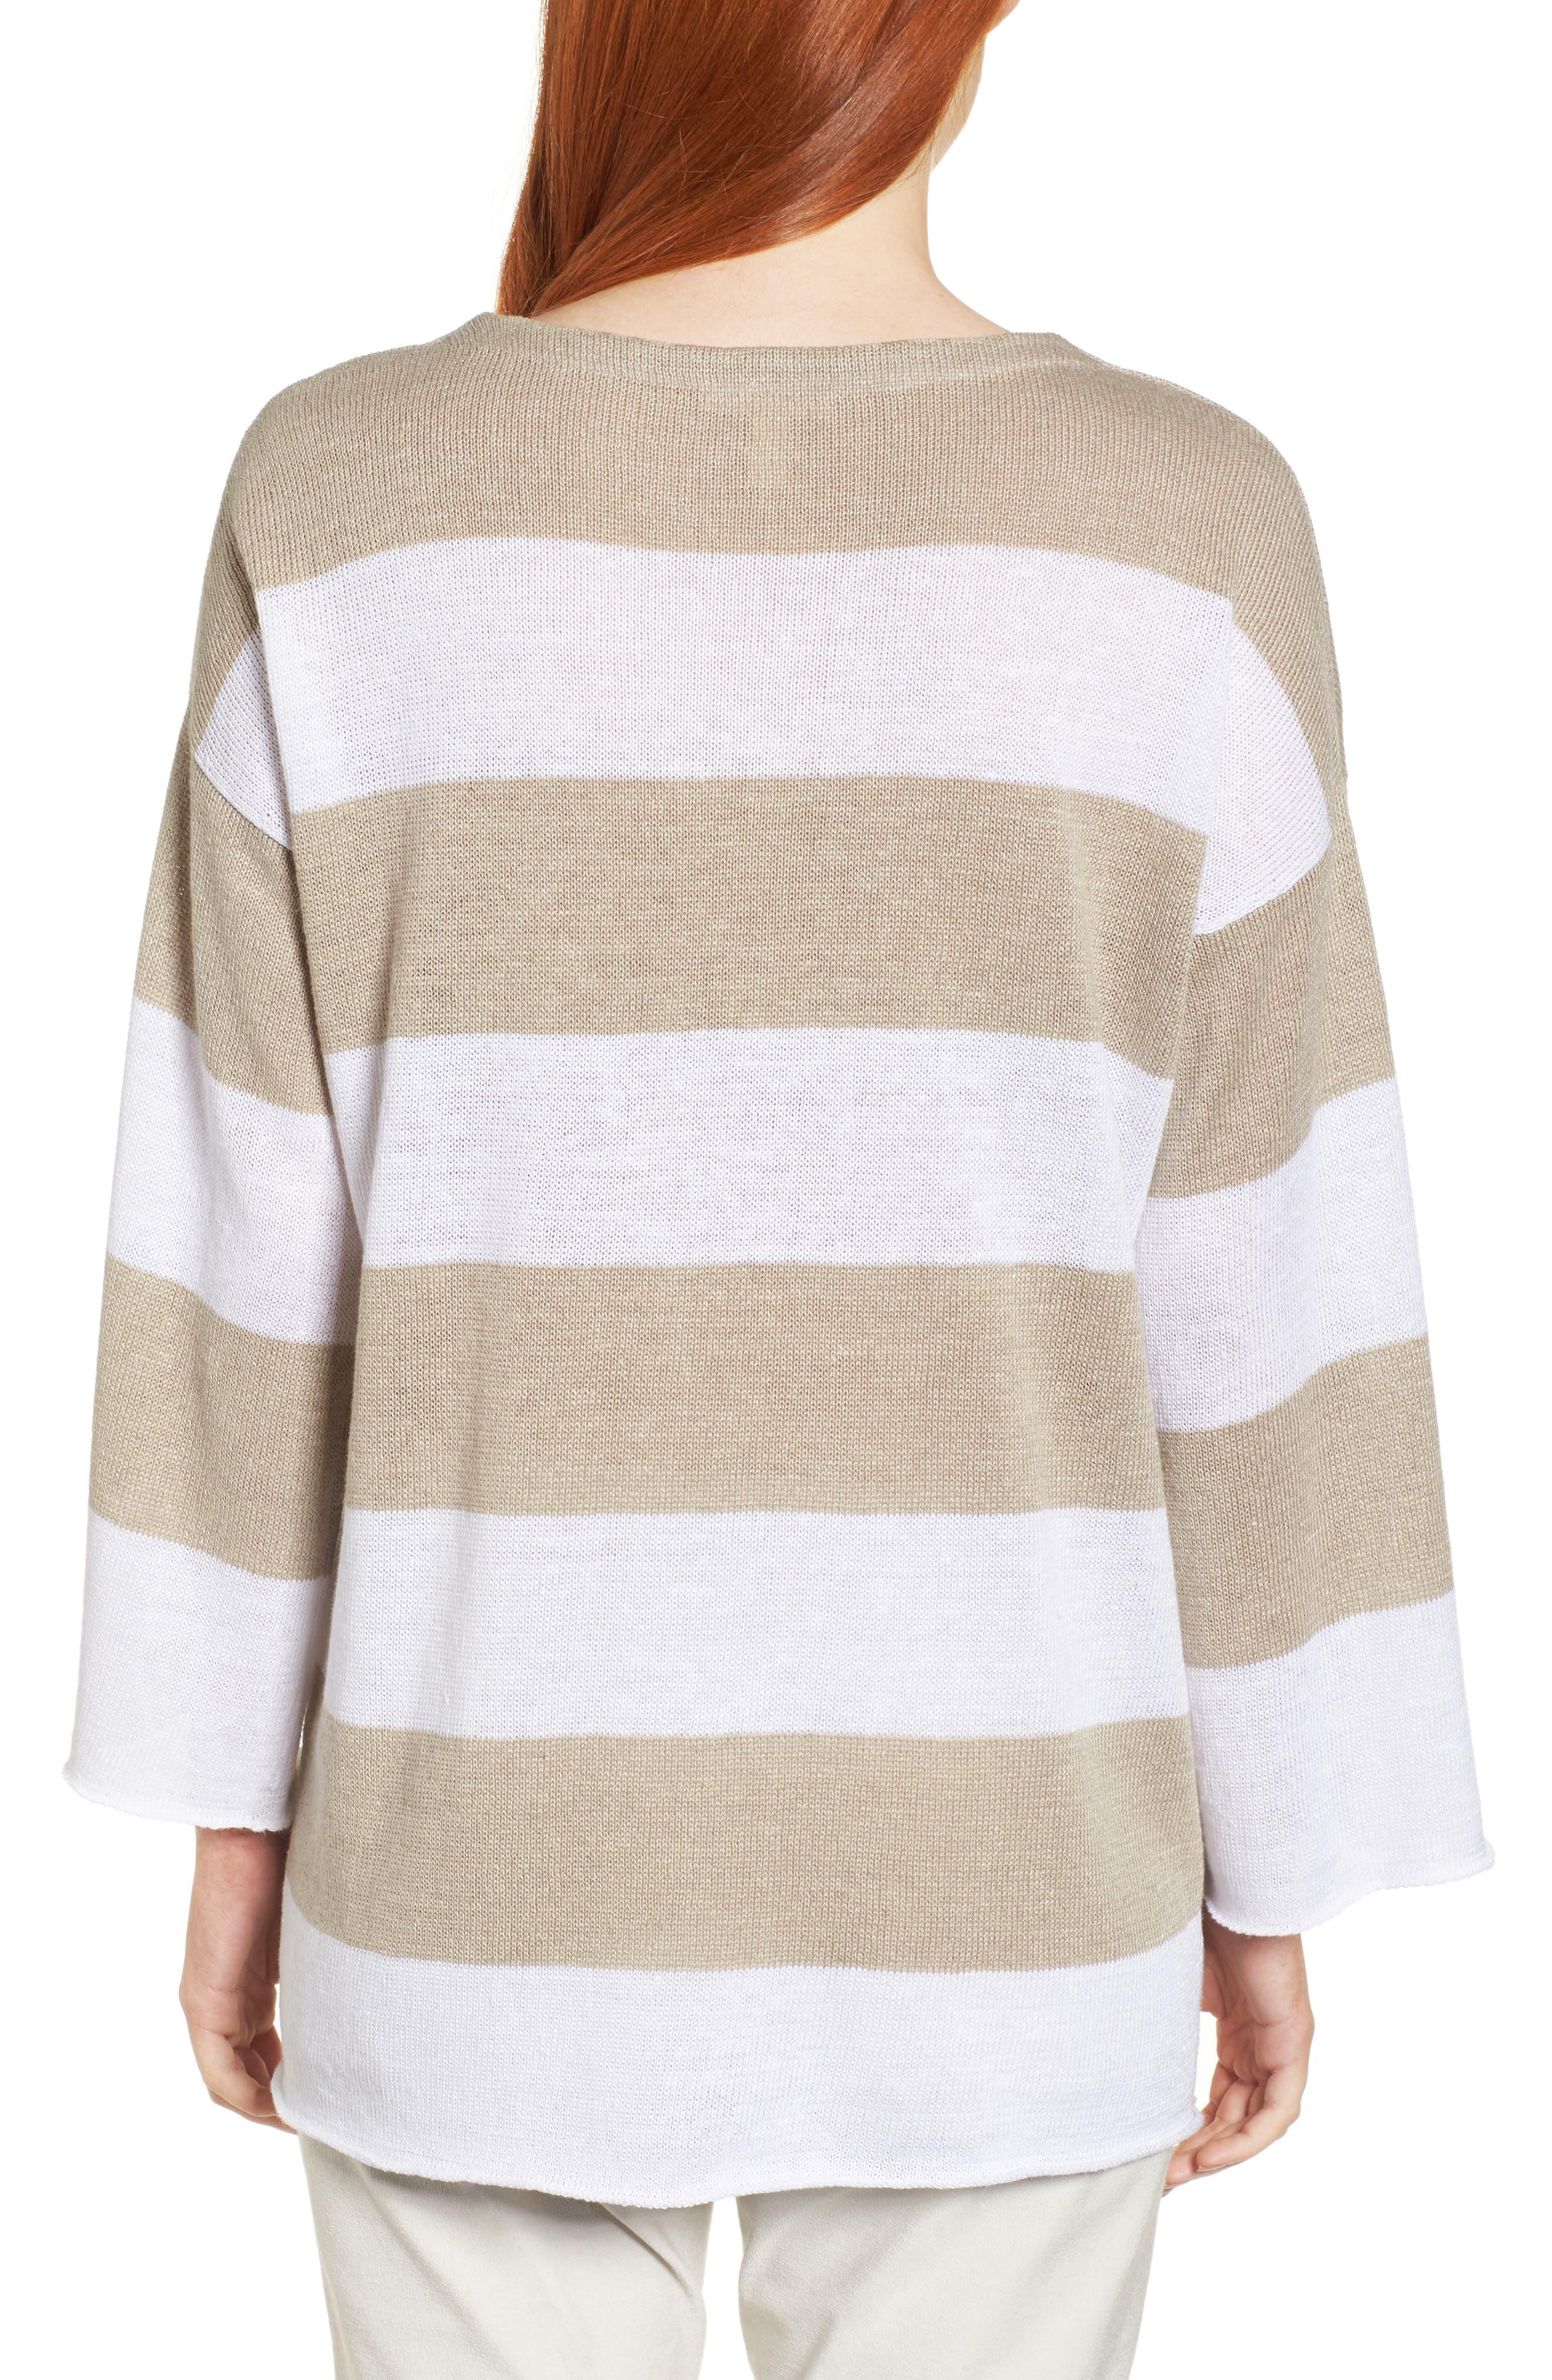 Stripe Organic Linen Knit A-Line Top,                             Alternate thumbnail 2, color,                             White/ Natural